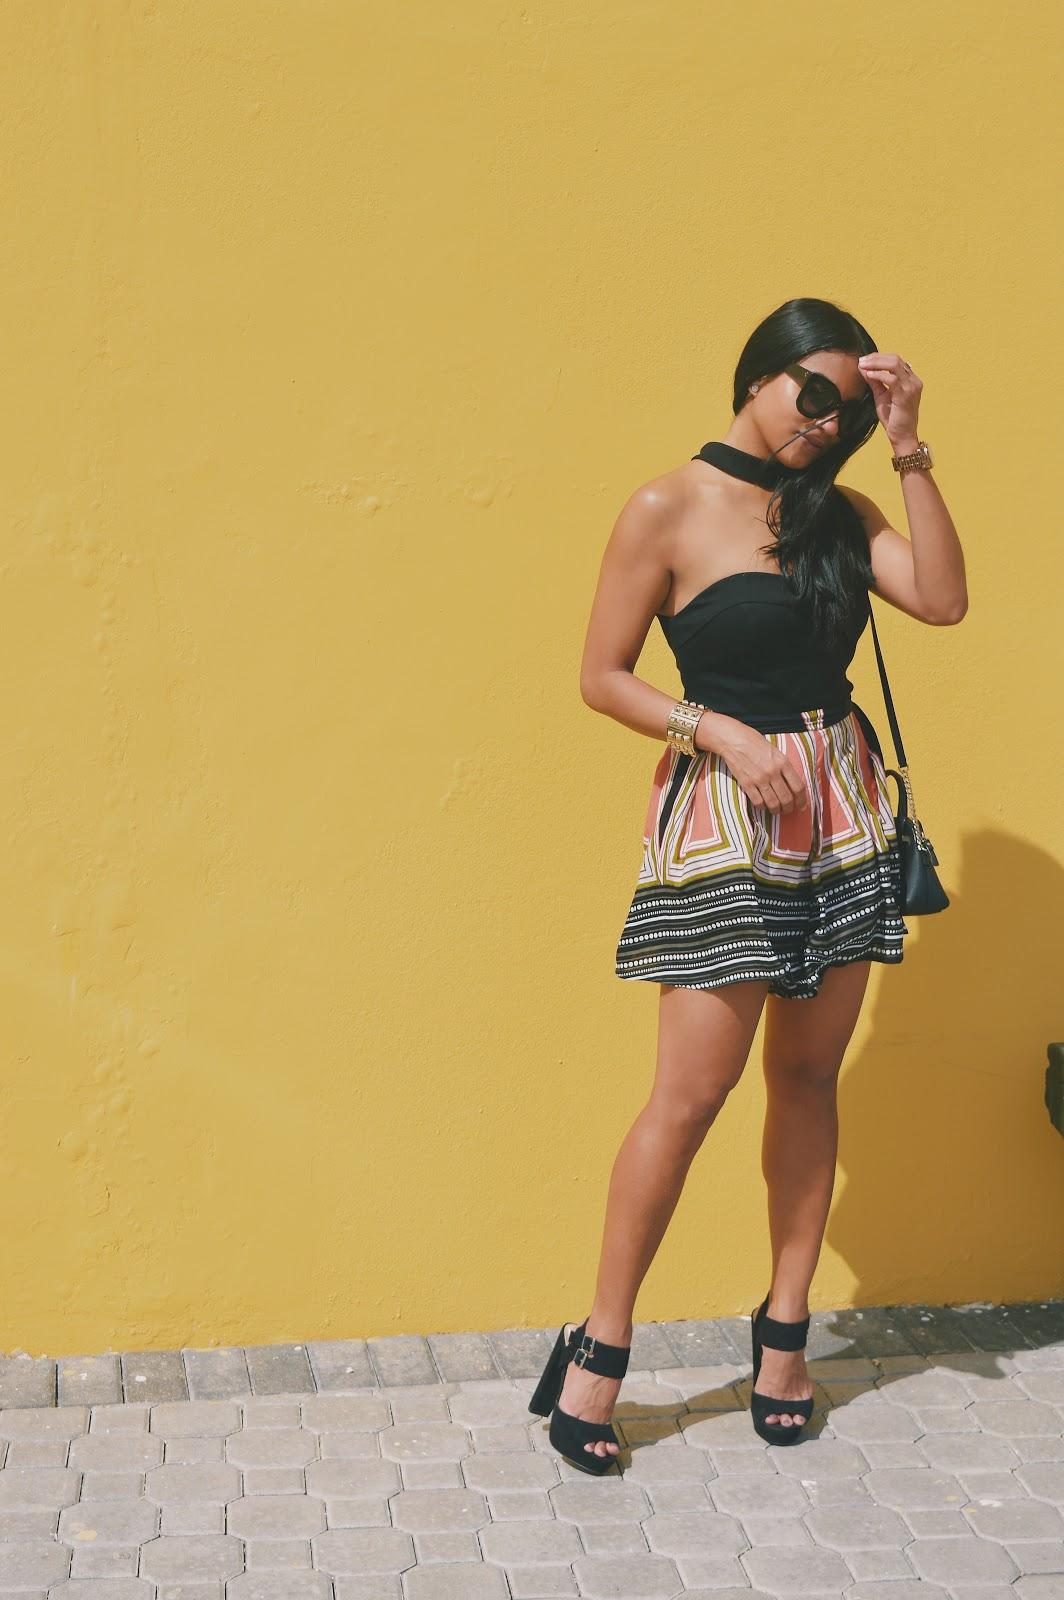 women fashion forever21 romper selfieleslie the fashionably late blog aishly boho